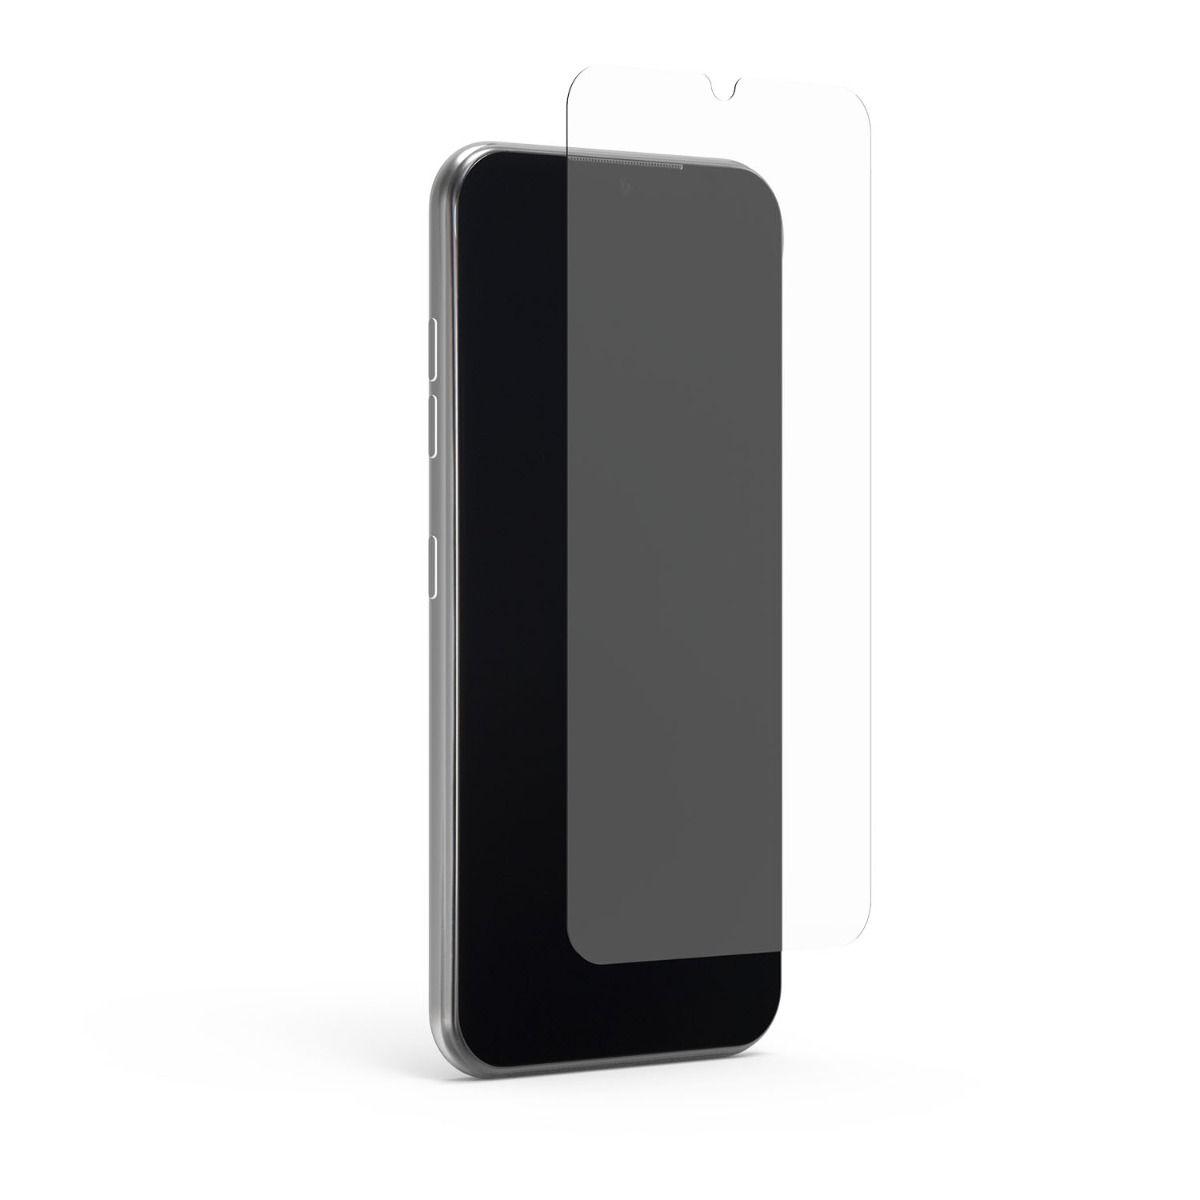 LG K8x/ Fortune 3/ Risio 4/ Phoenix 5/ Tribute Monarch/ K31/ K31 Rebel High-Definition Glass Screen Protector (No Alignment Tray)